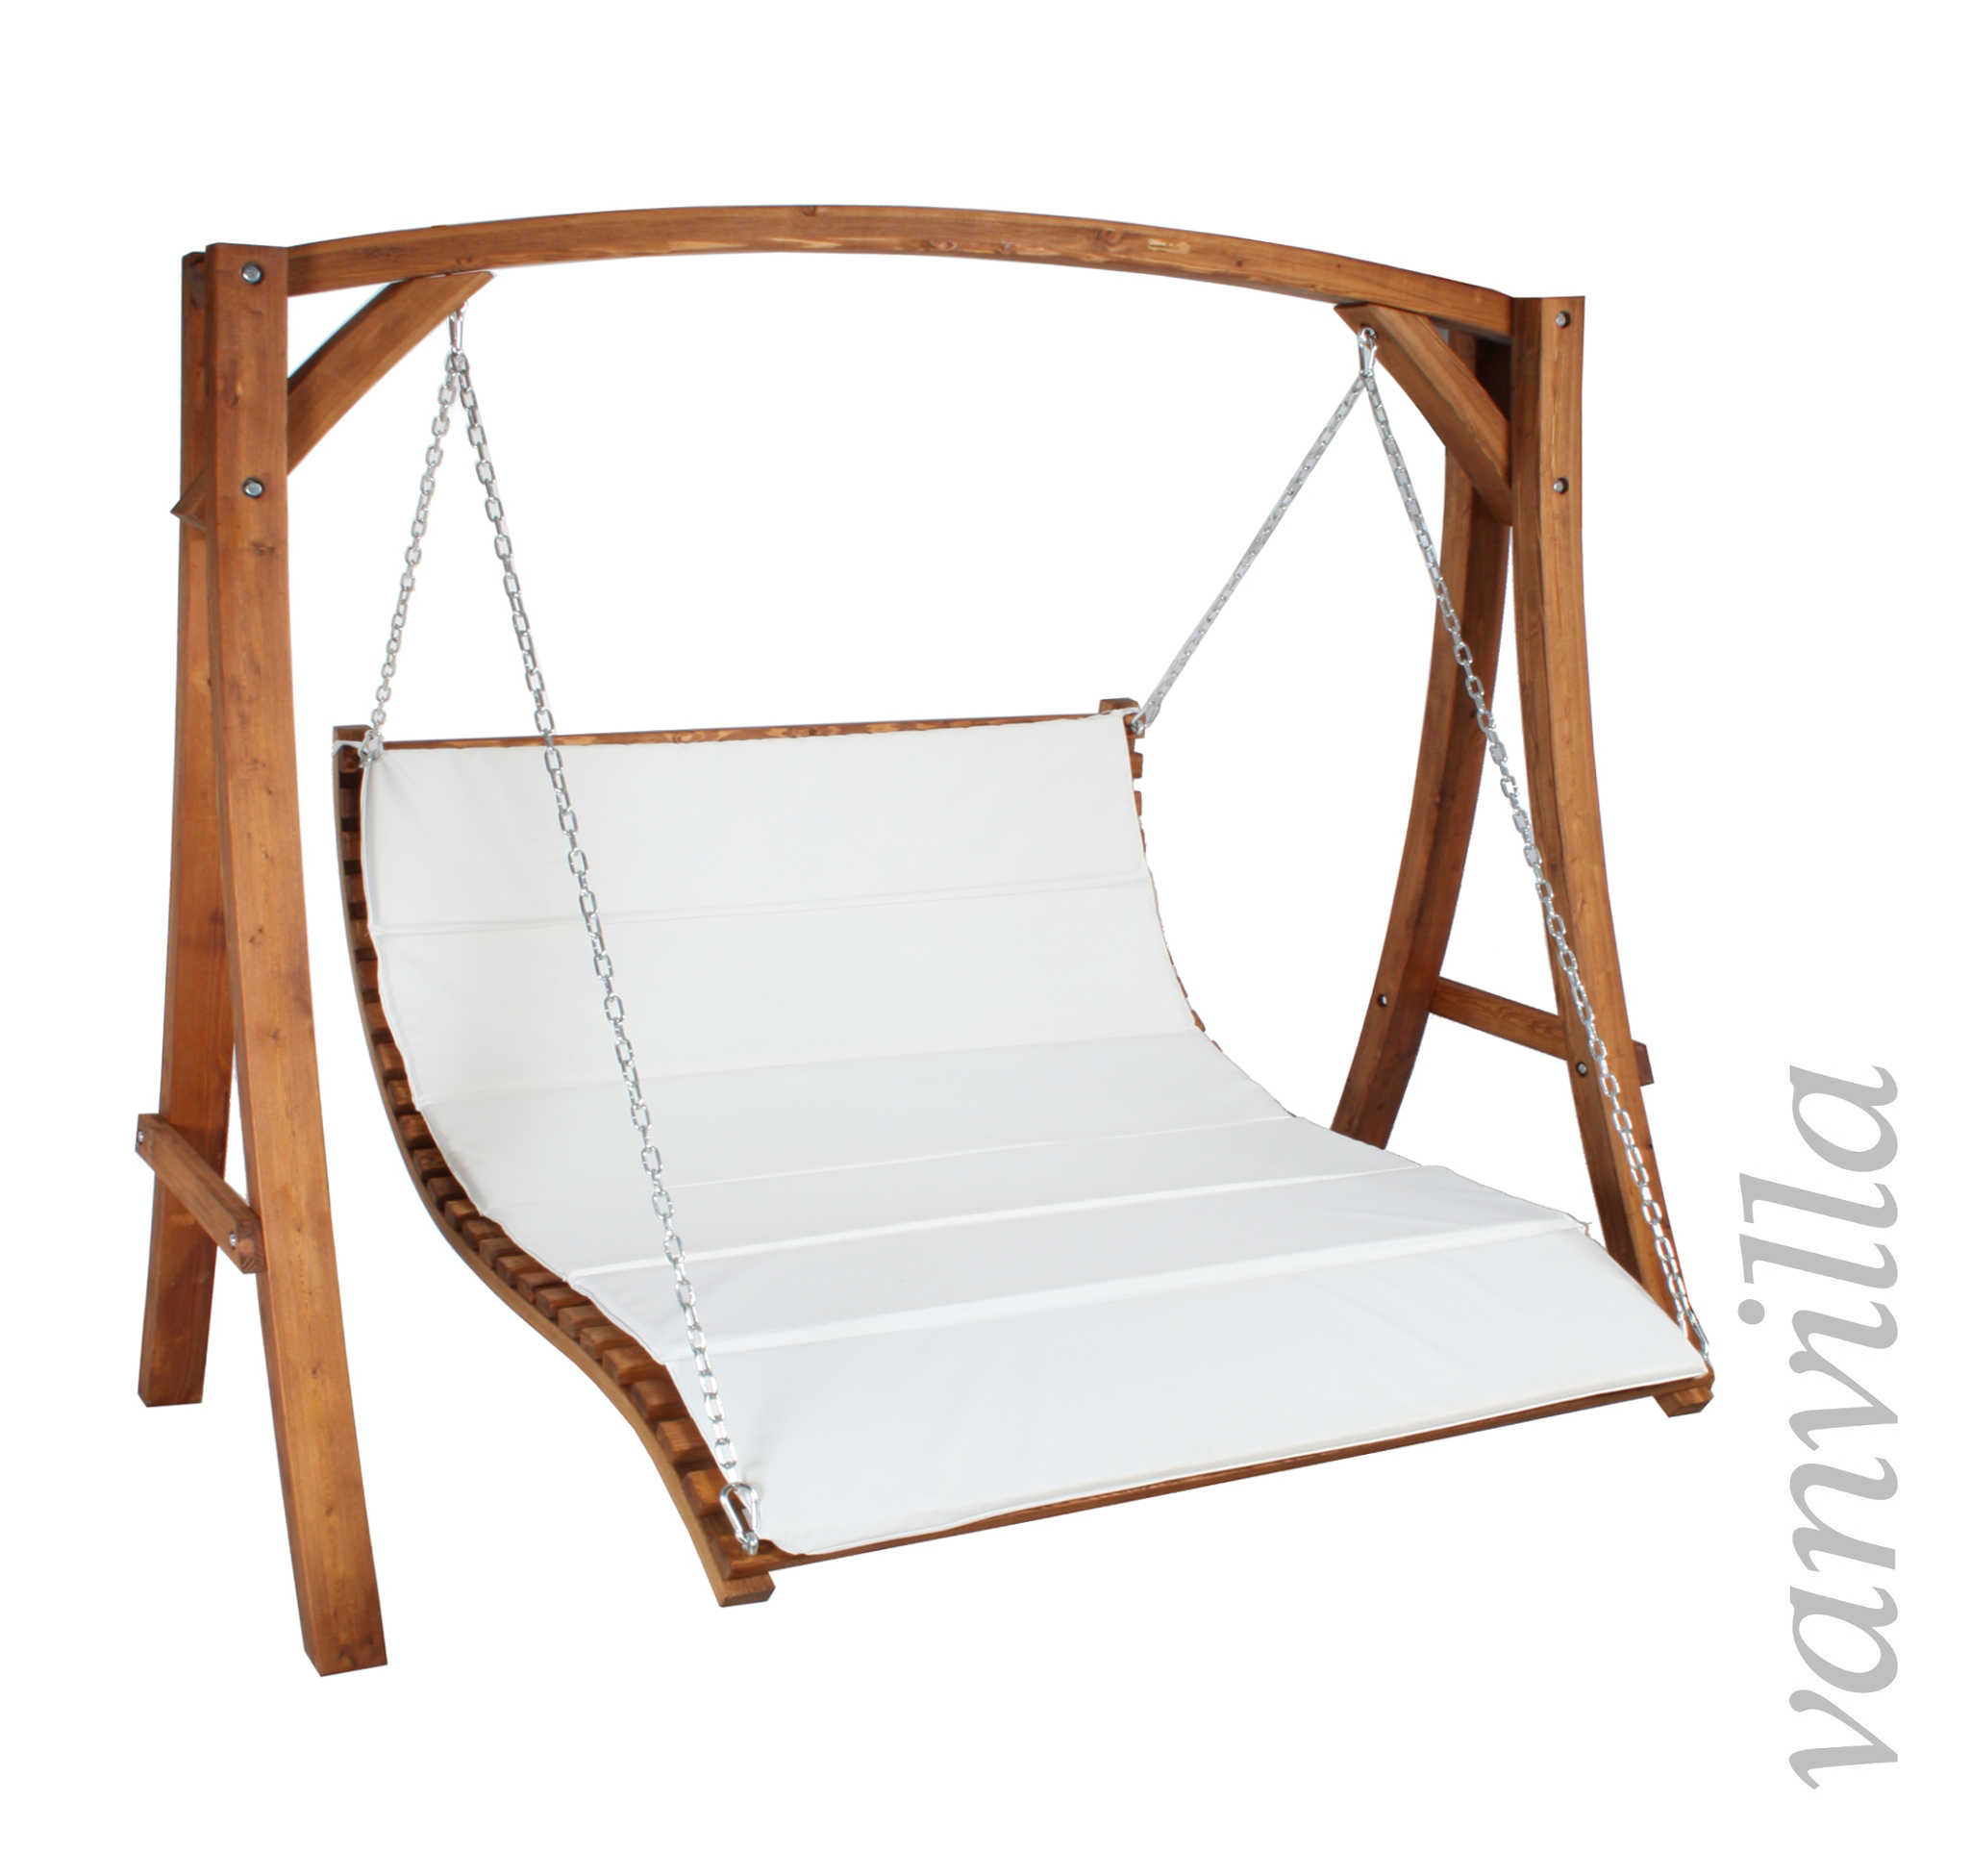 vanvilla sonnenliege h ngeliege doppelliege hollywoodschaukel gartenliege ebay. Black Bedroom Furniture Sets. Home Design Ideas